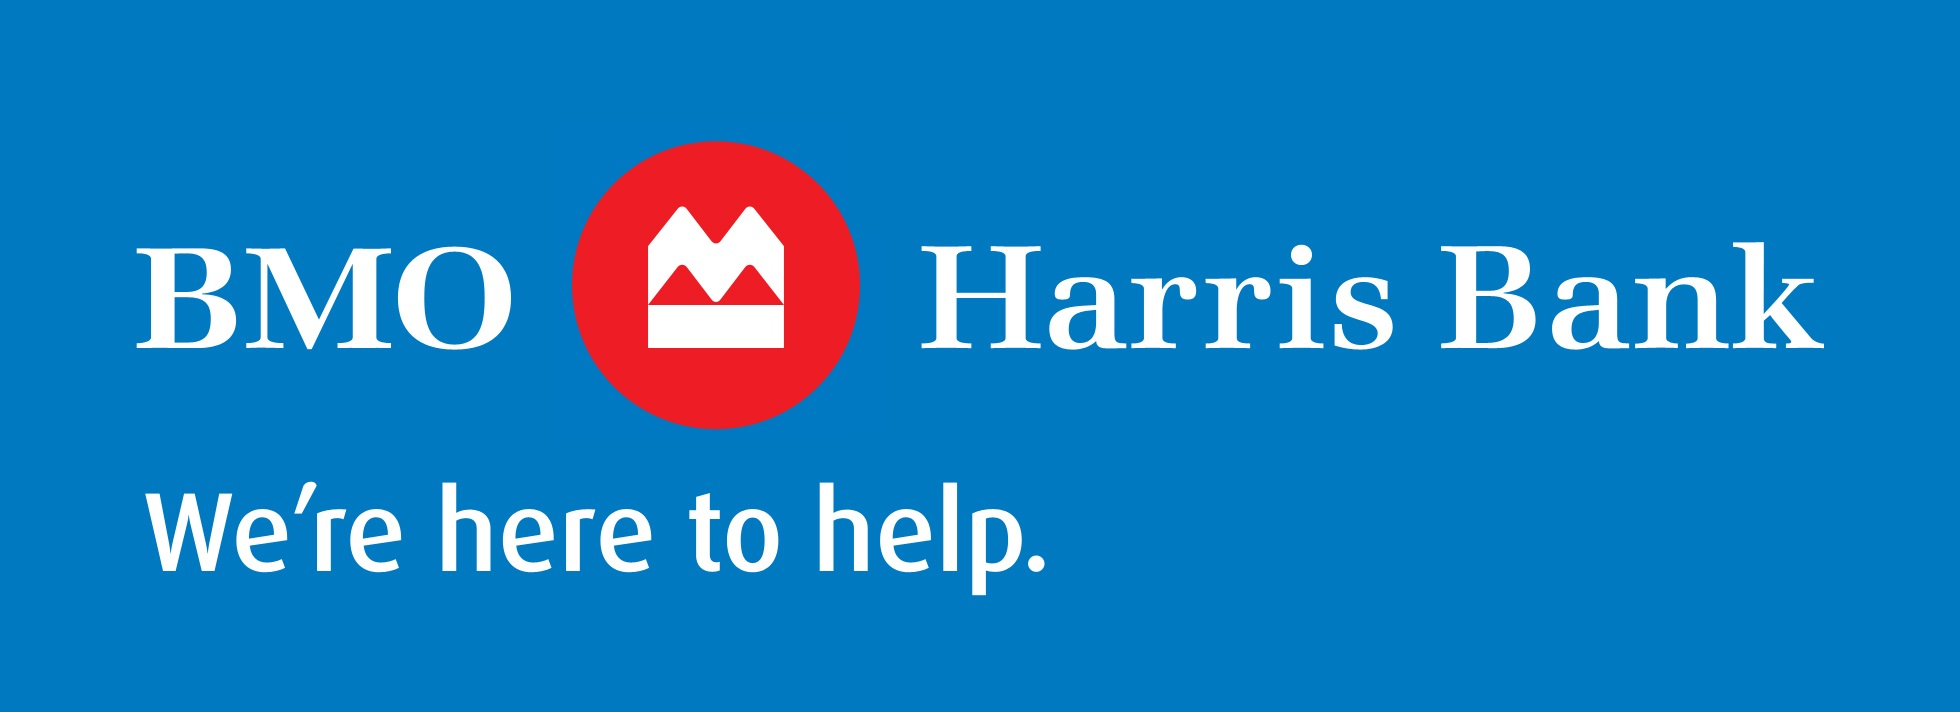 BHO Harris Logo